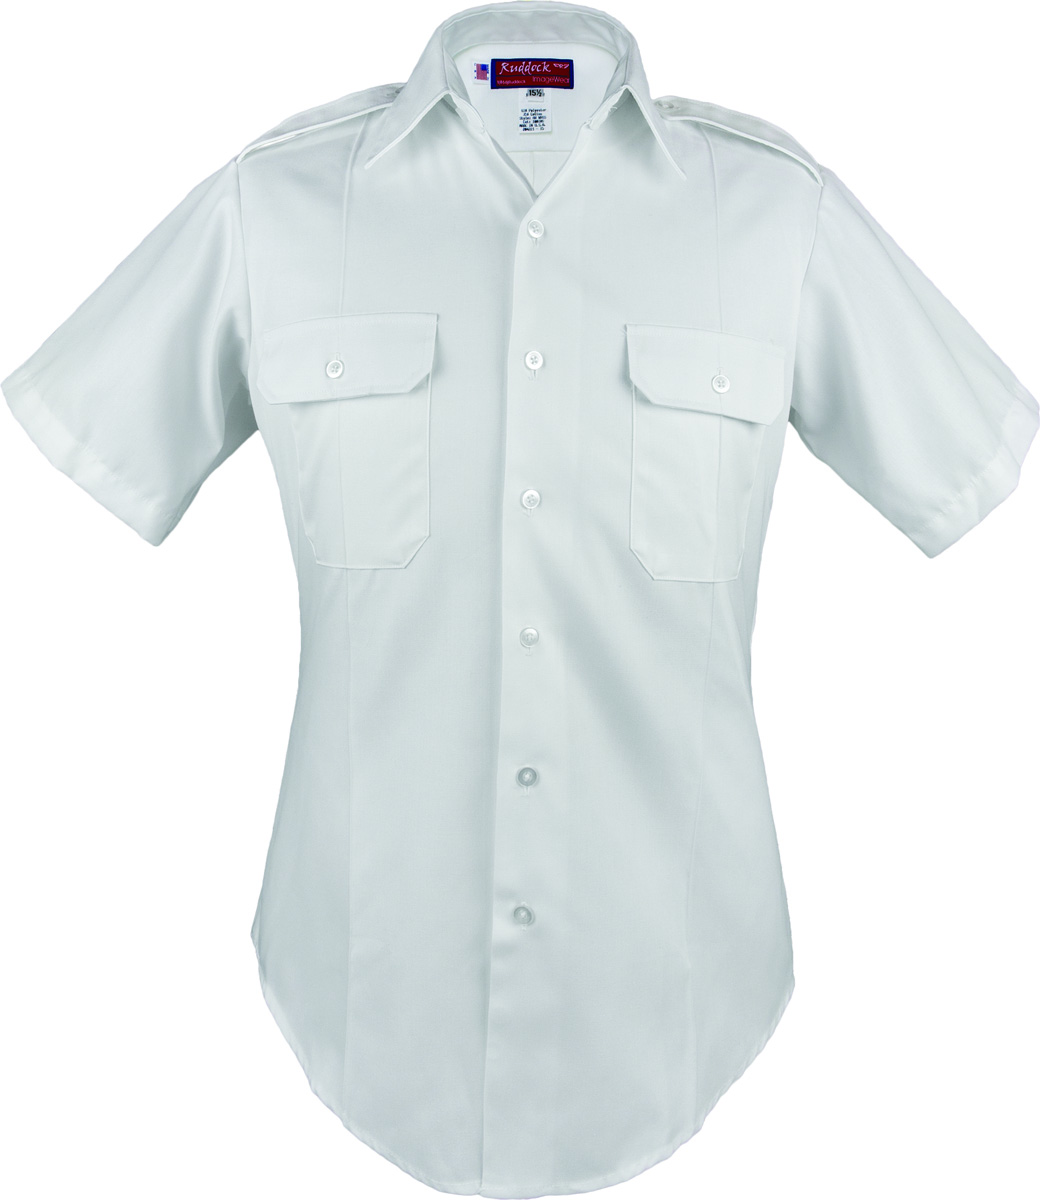 Male army white short sleeve duty shirt us military for Jrotc t shirt designs